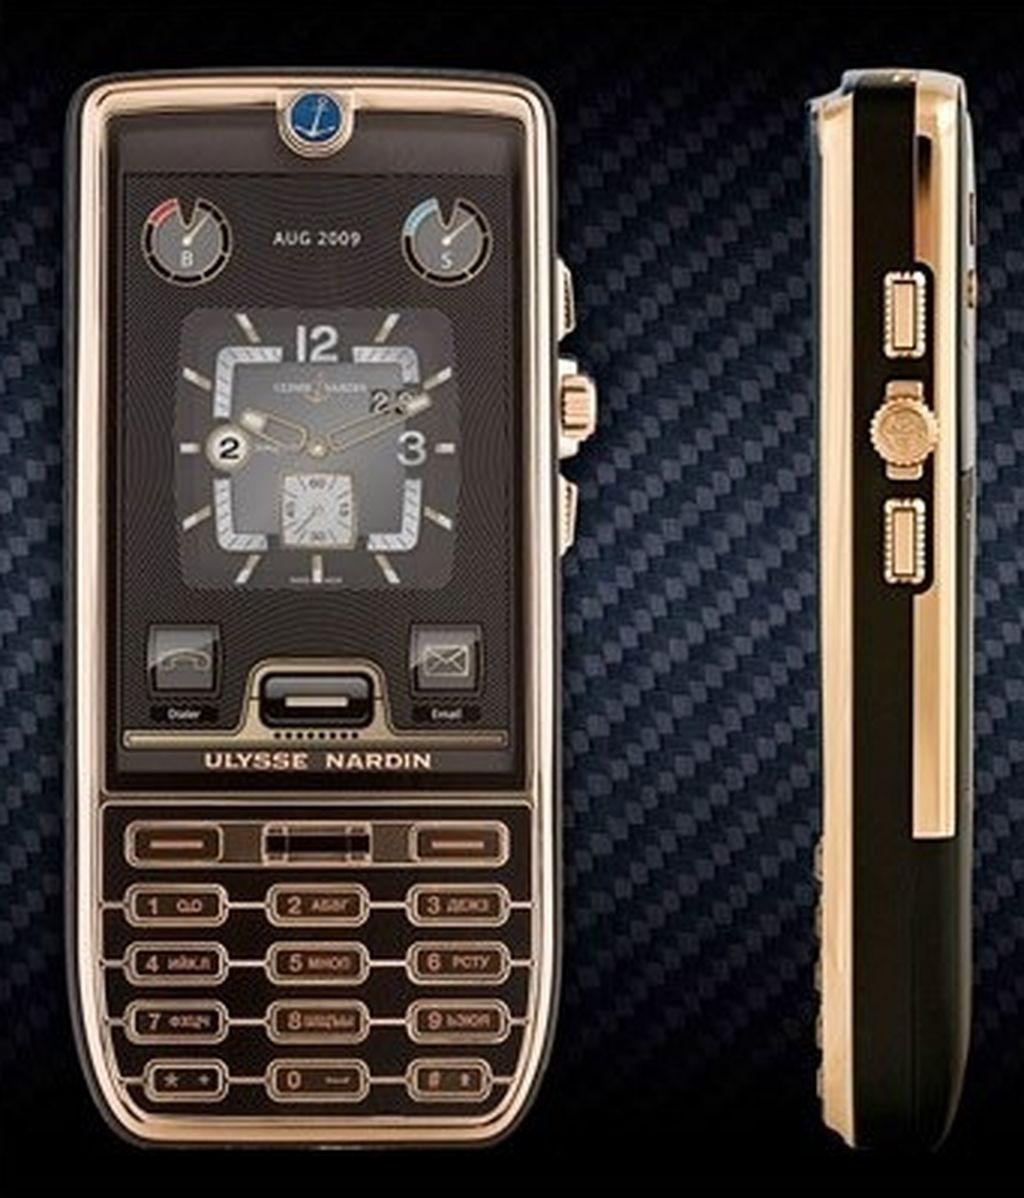 Ulysse_Nardin_Chairman_Diamond-Edition-phone